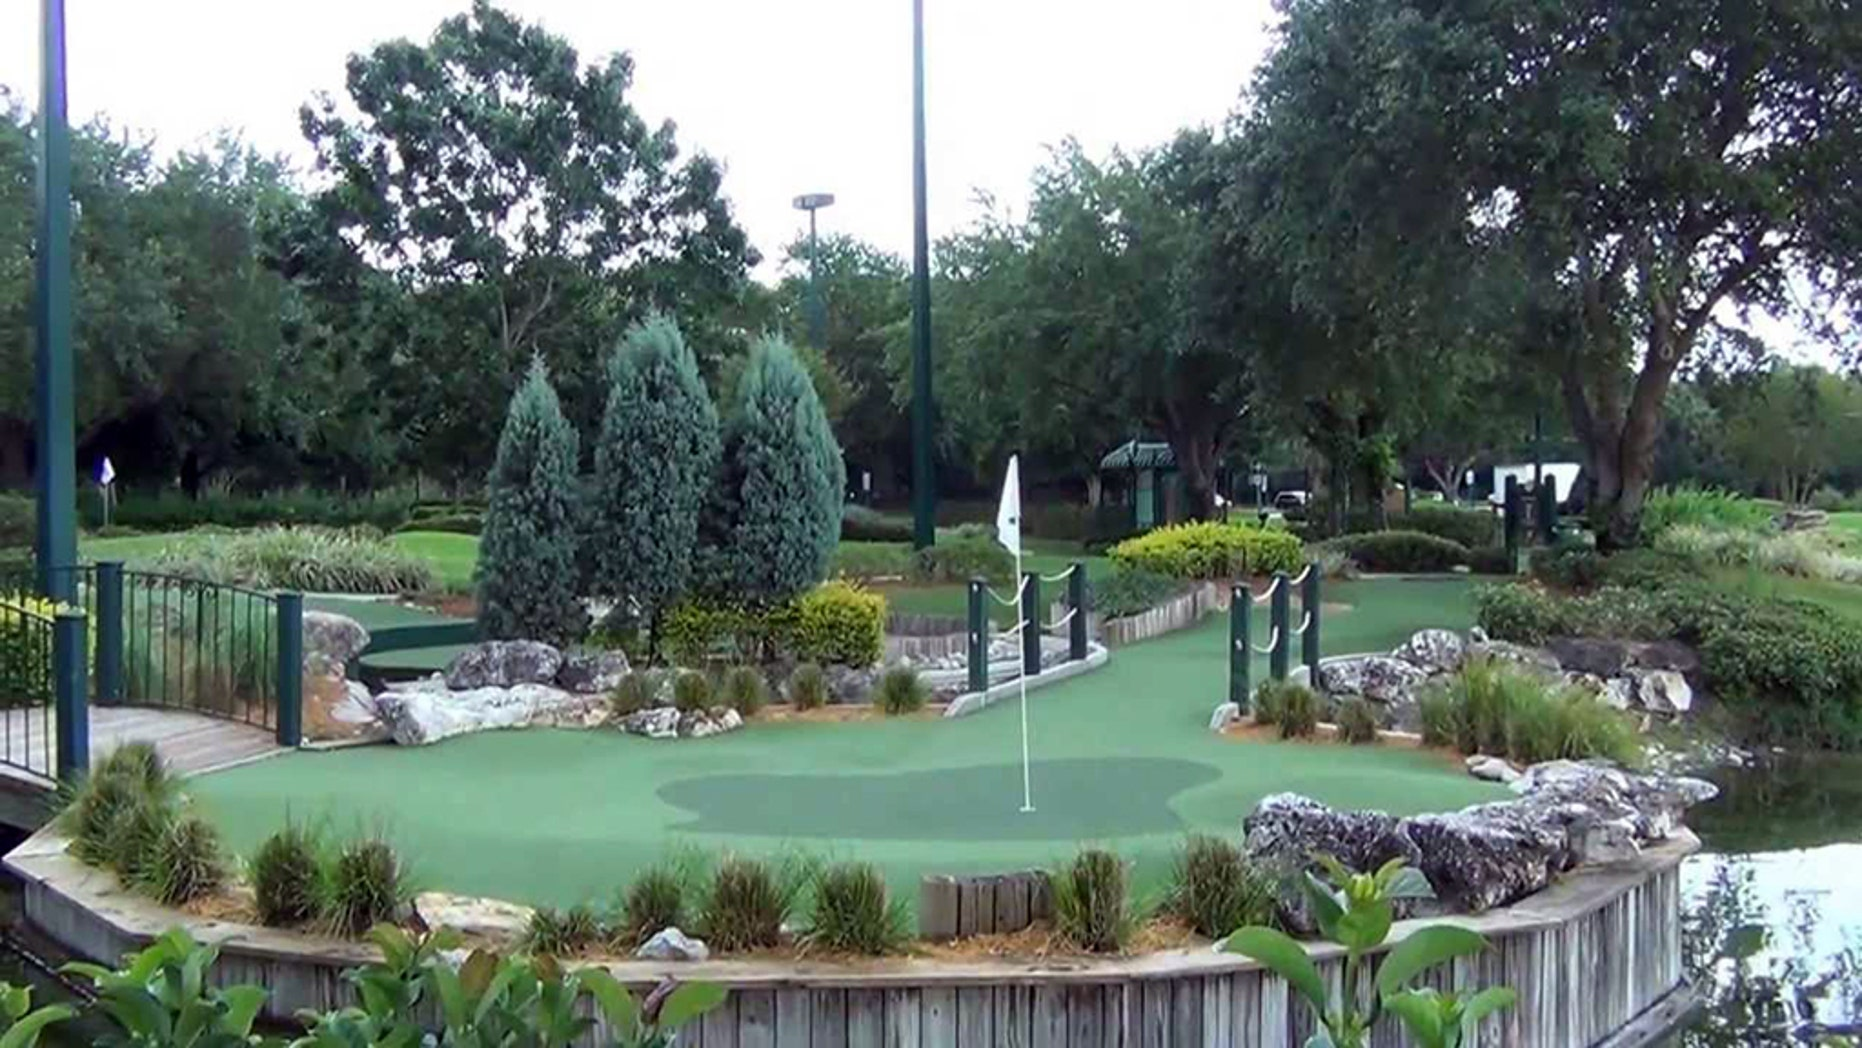 Fantasia Gardens miniature golf course at Disney World in Orlando.